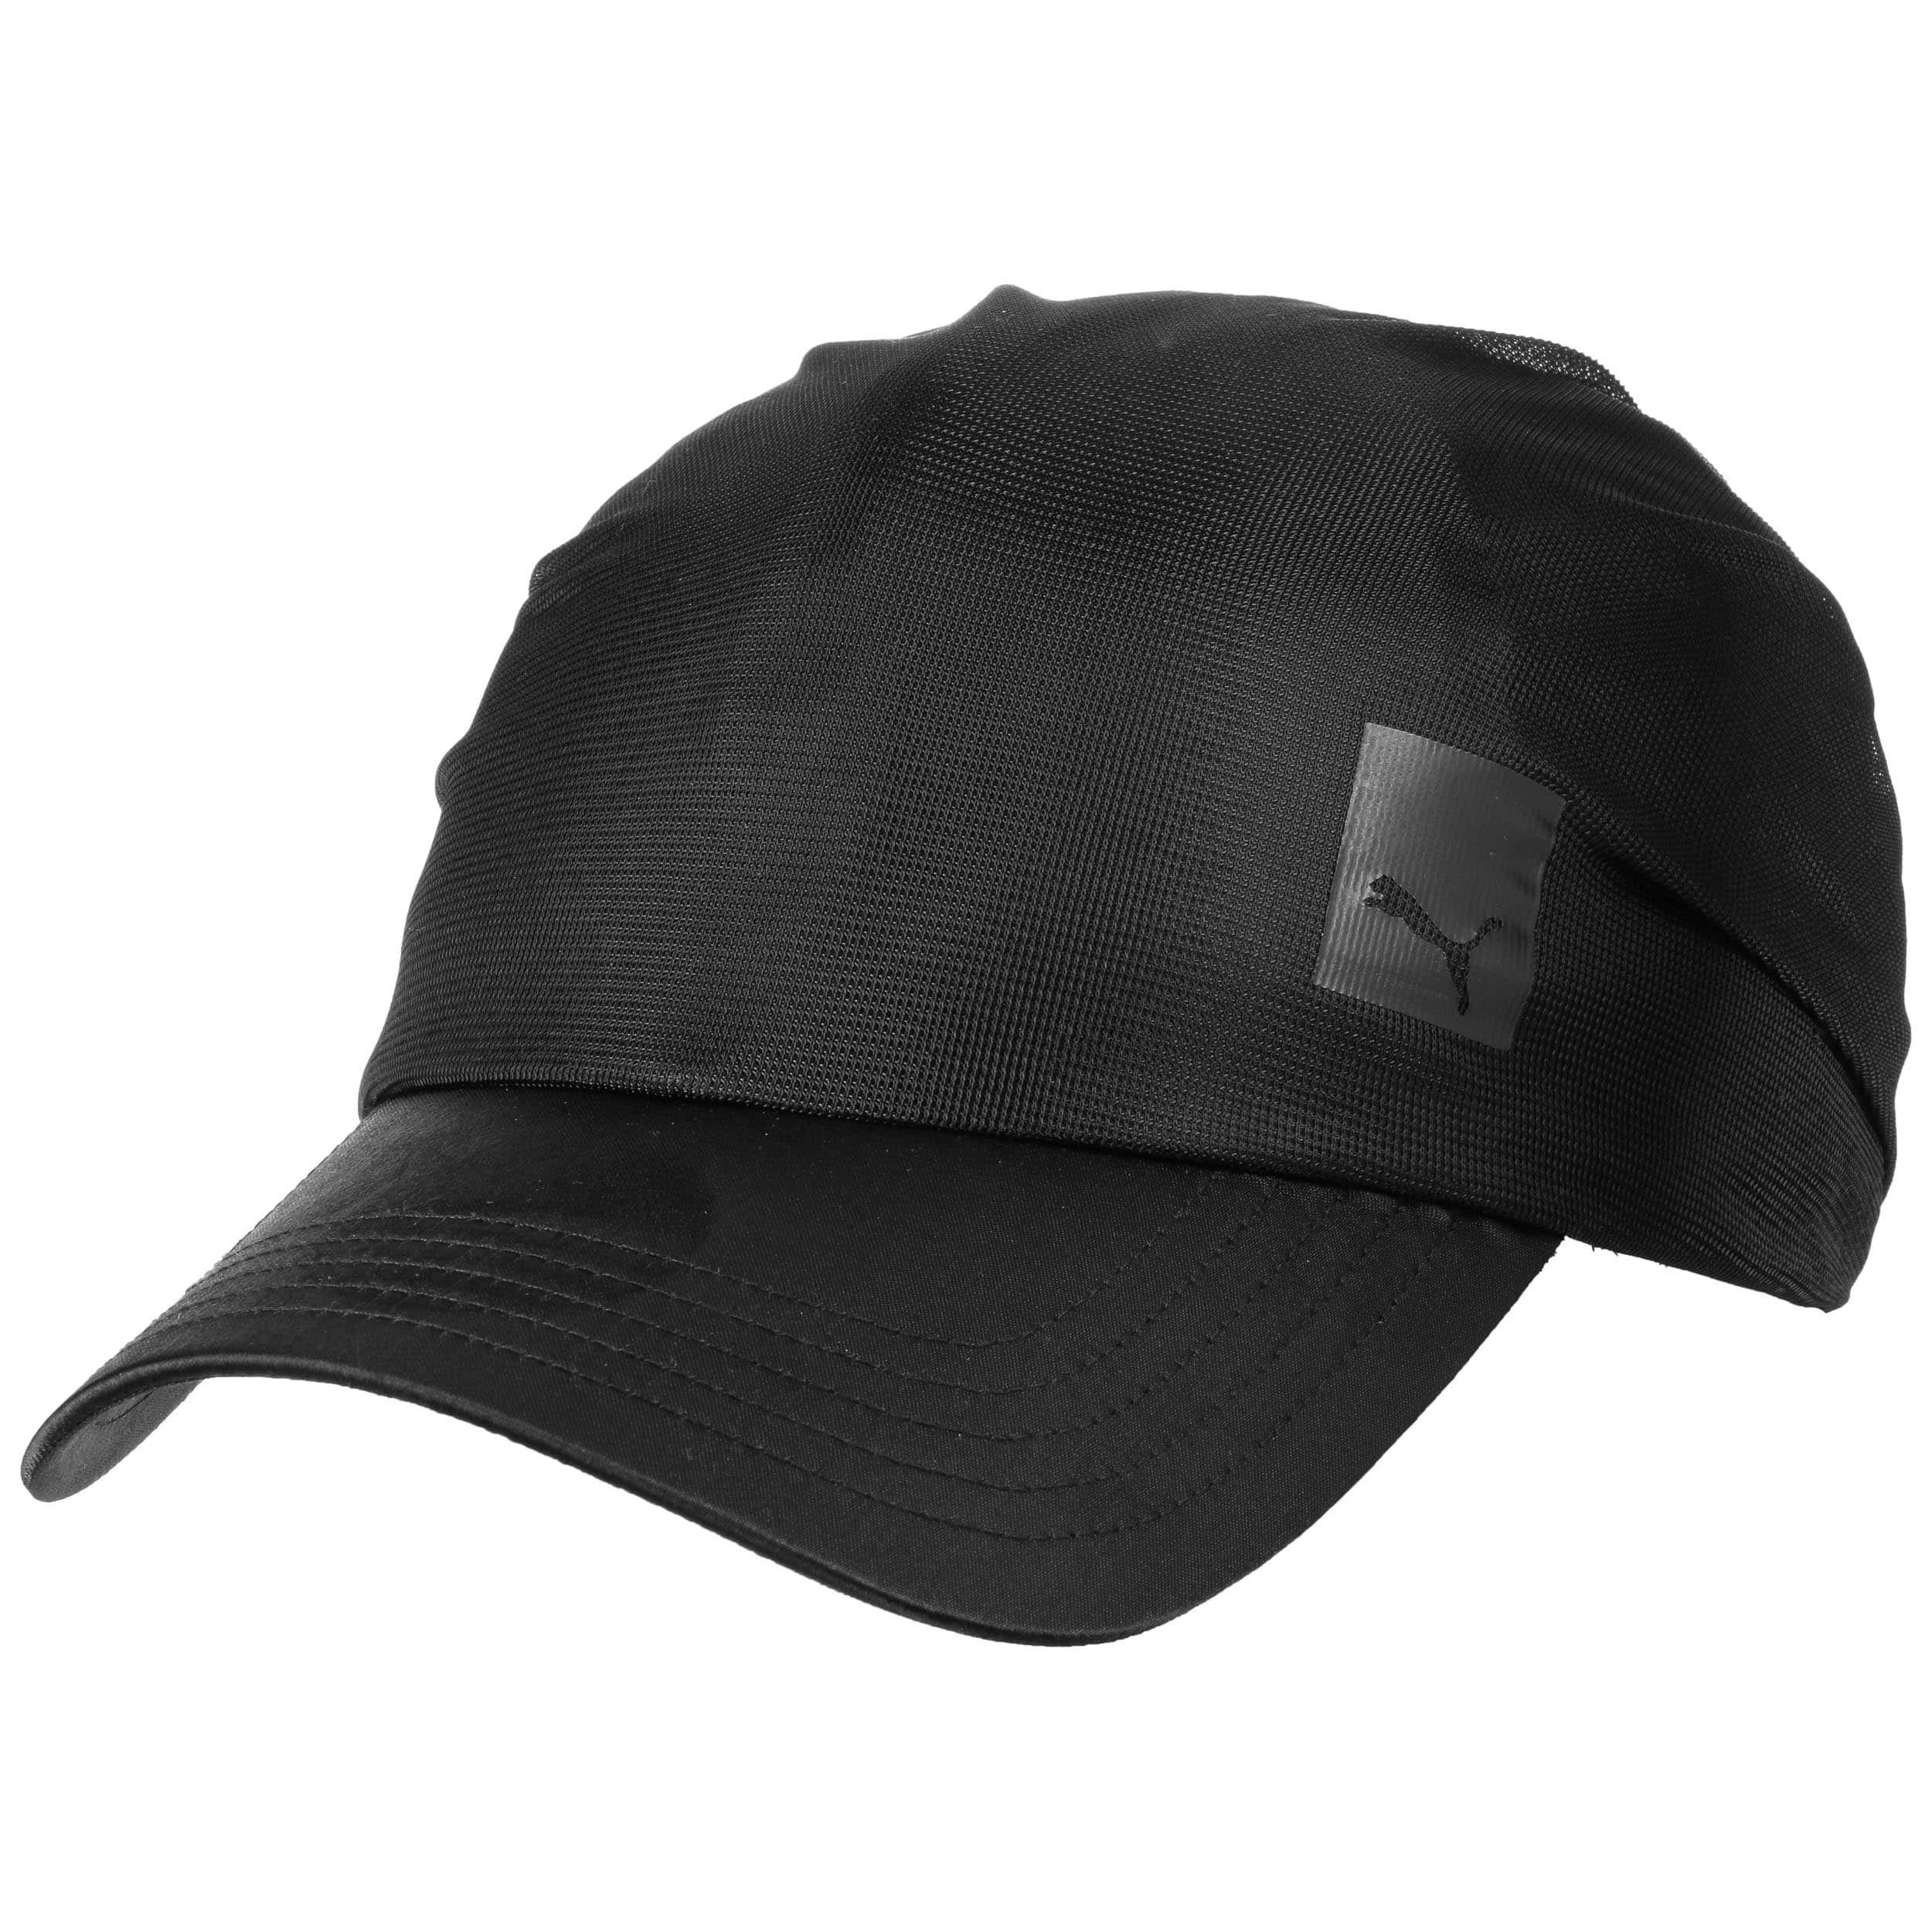 En Pointe Bandana Cap By Puma Eur 24 95 Gt Hats Caps